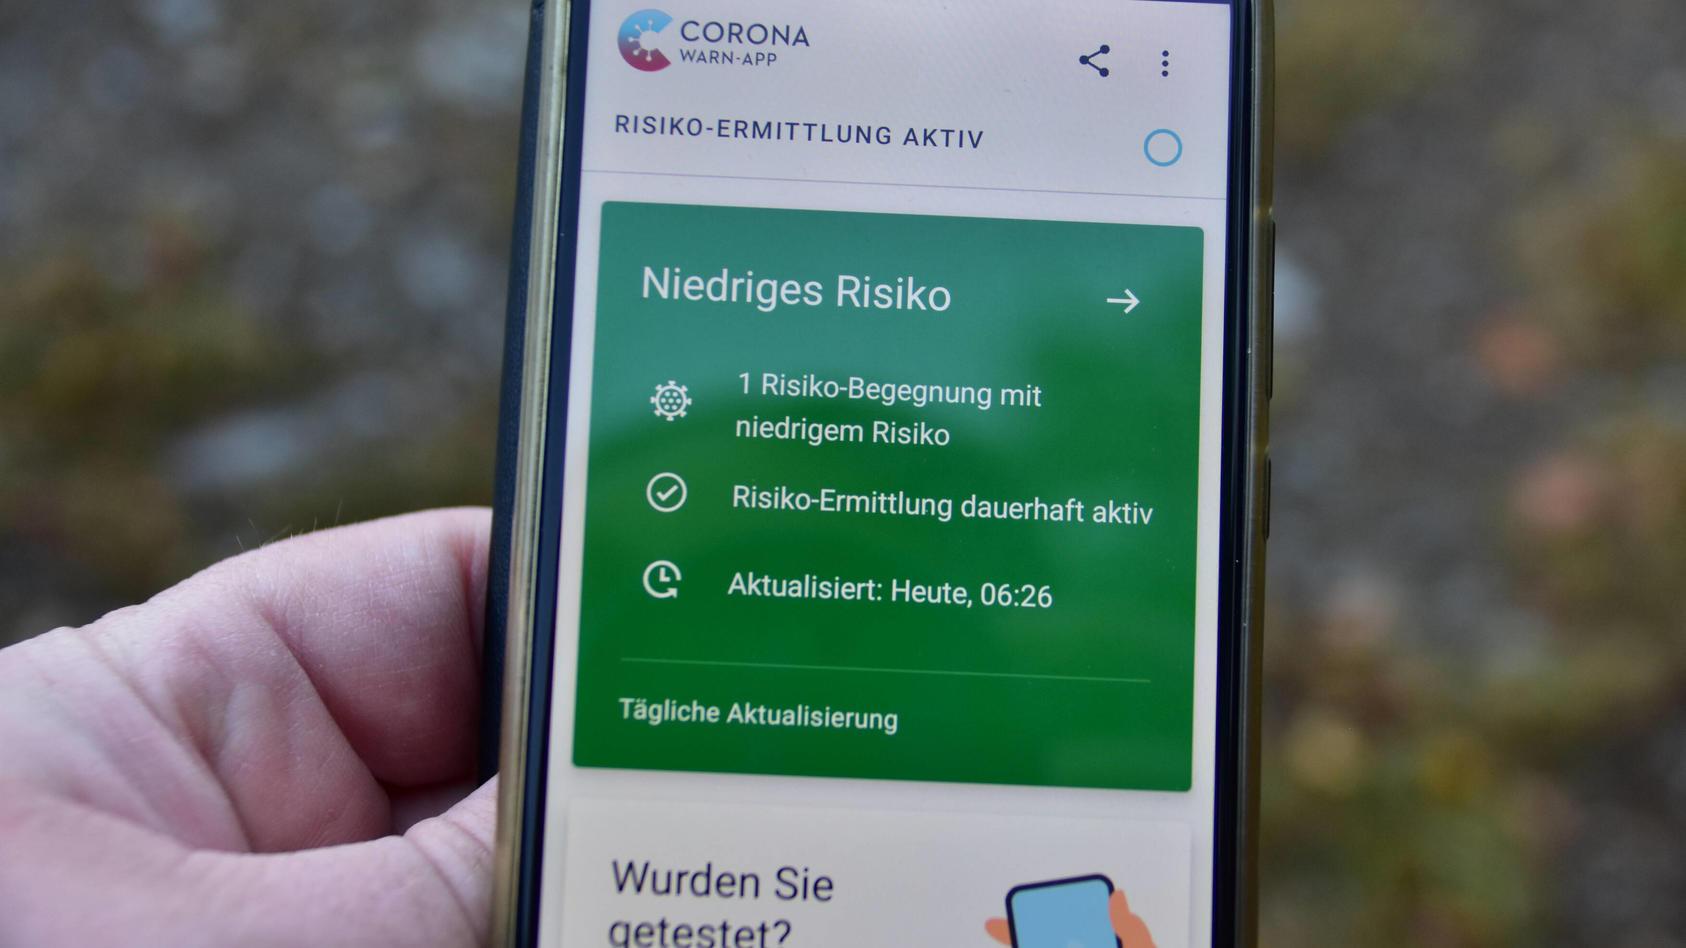 Corona Warn App - Risikobegegnung Meldung der Corona Warn App über eine Risiko Begegnung mit niedrigem Risiko Bad Laer